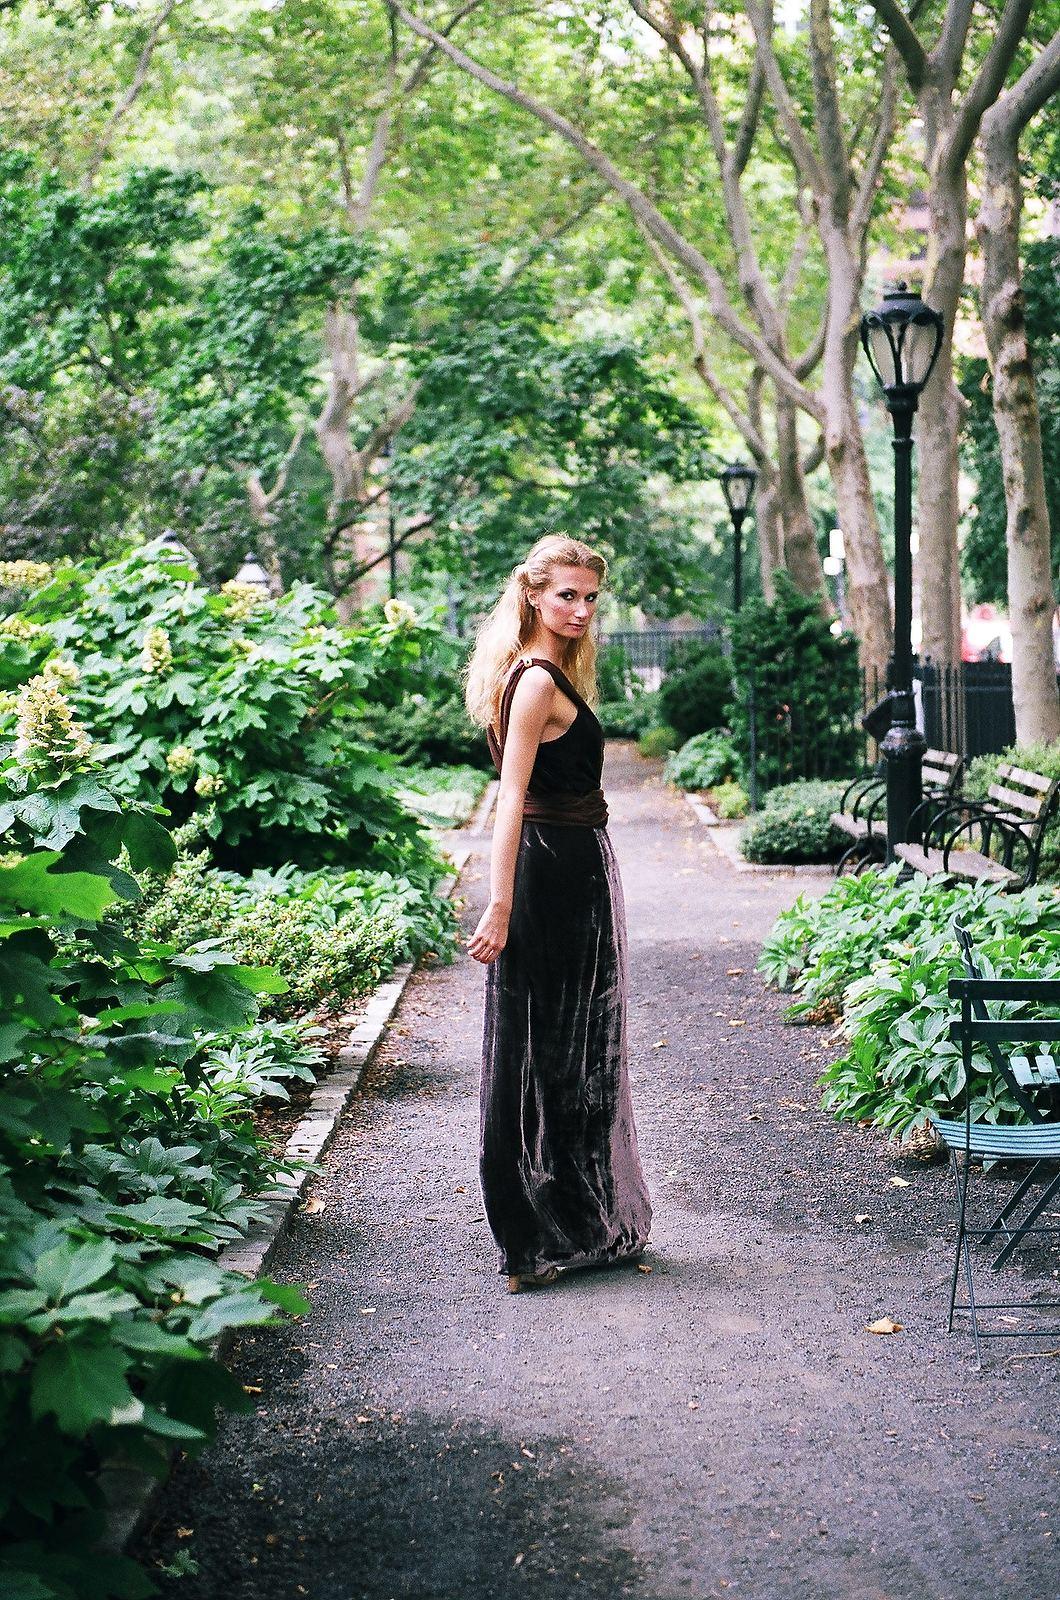 long dress with woman looking back at camera